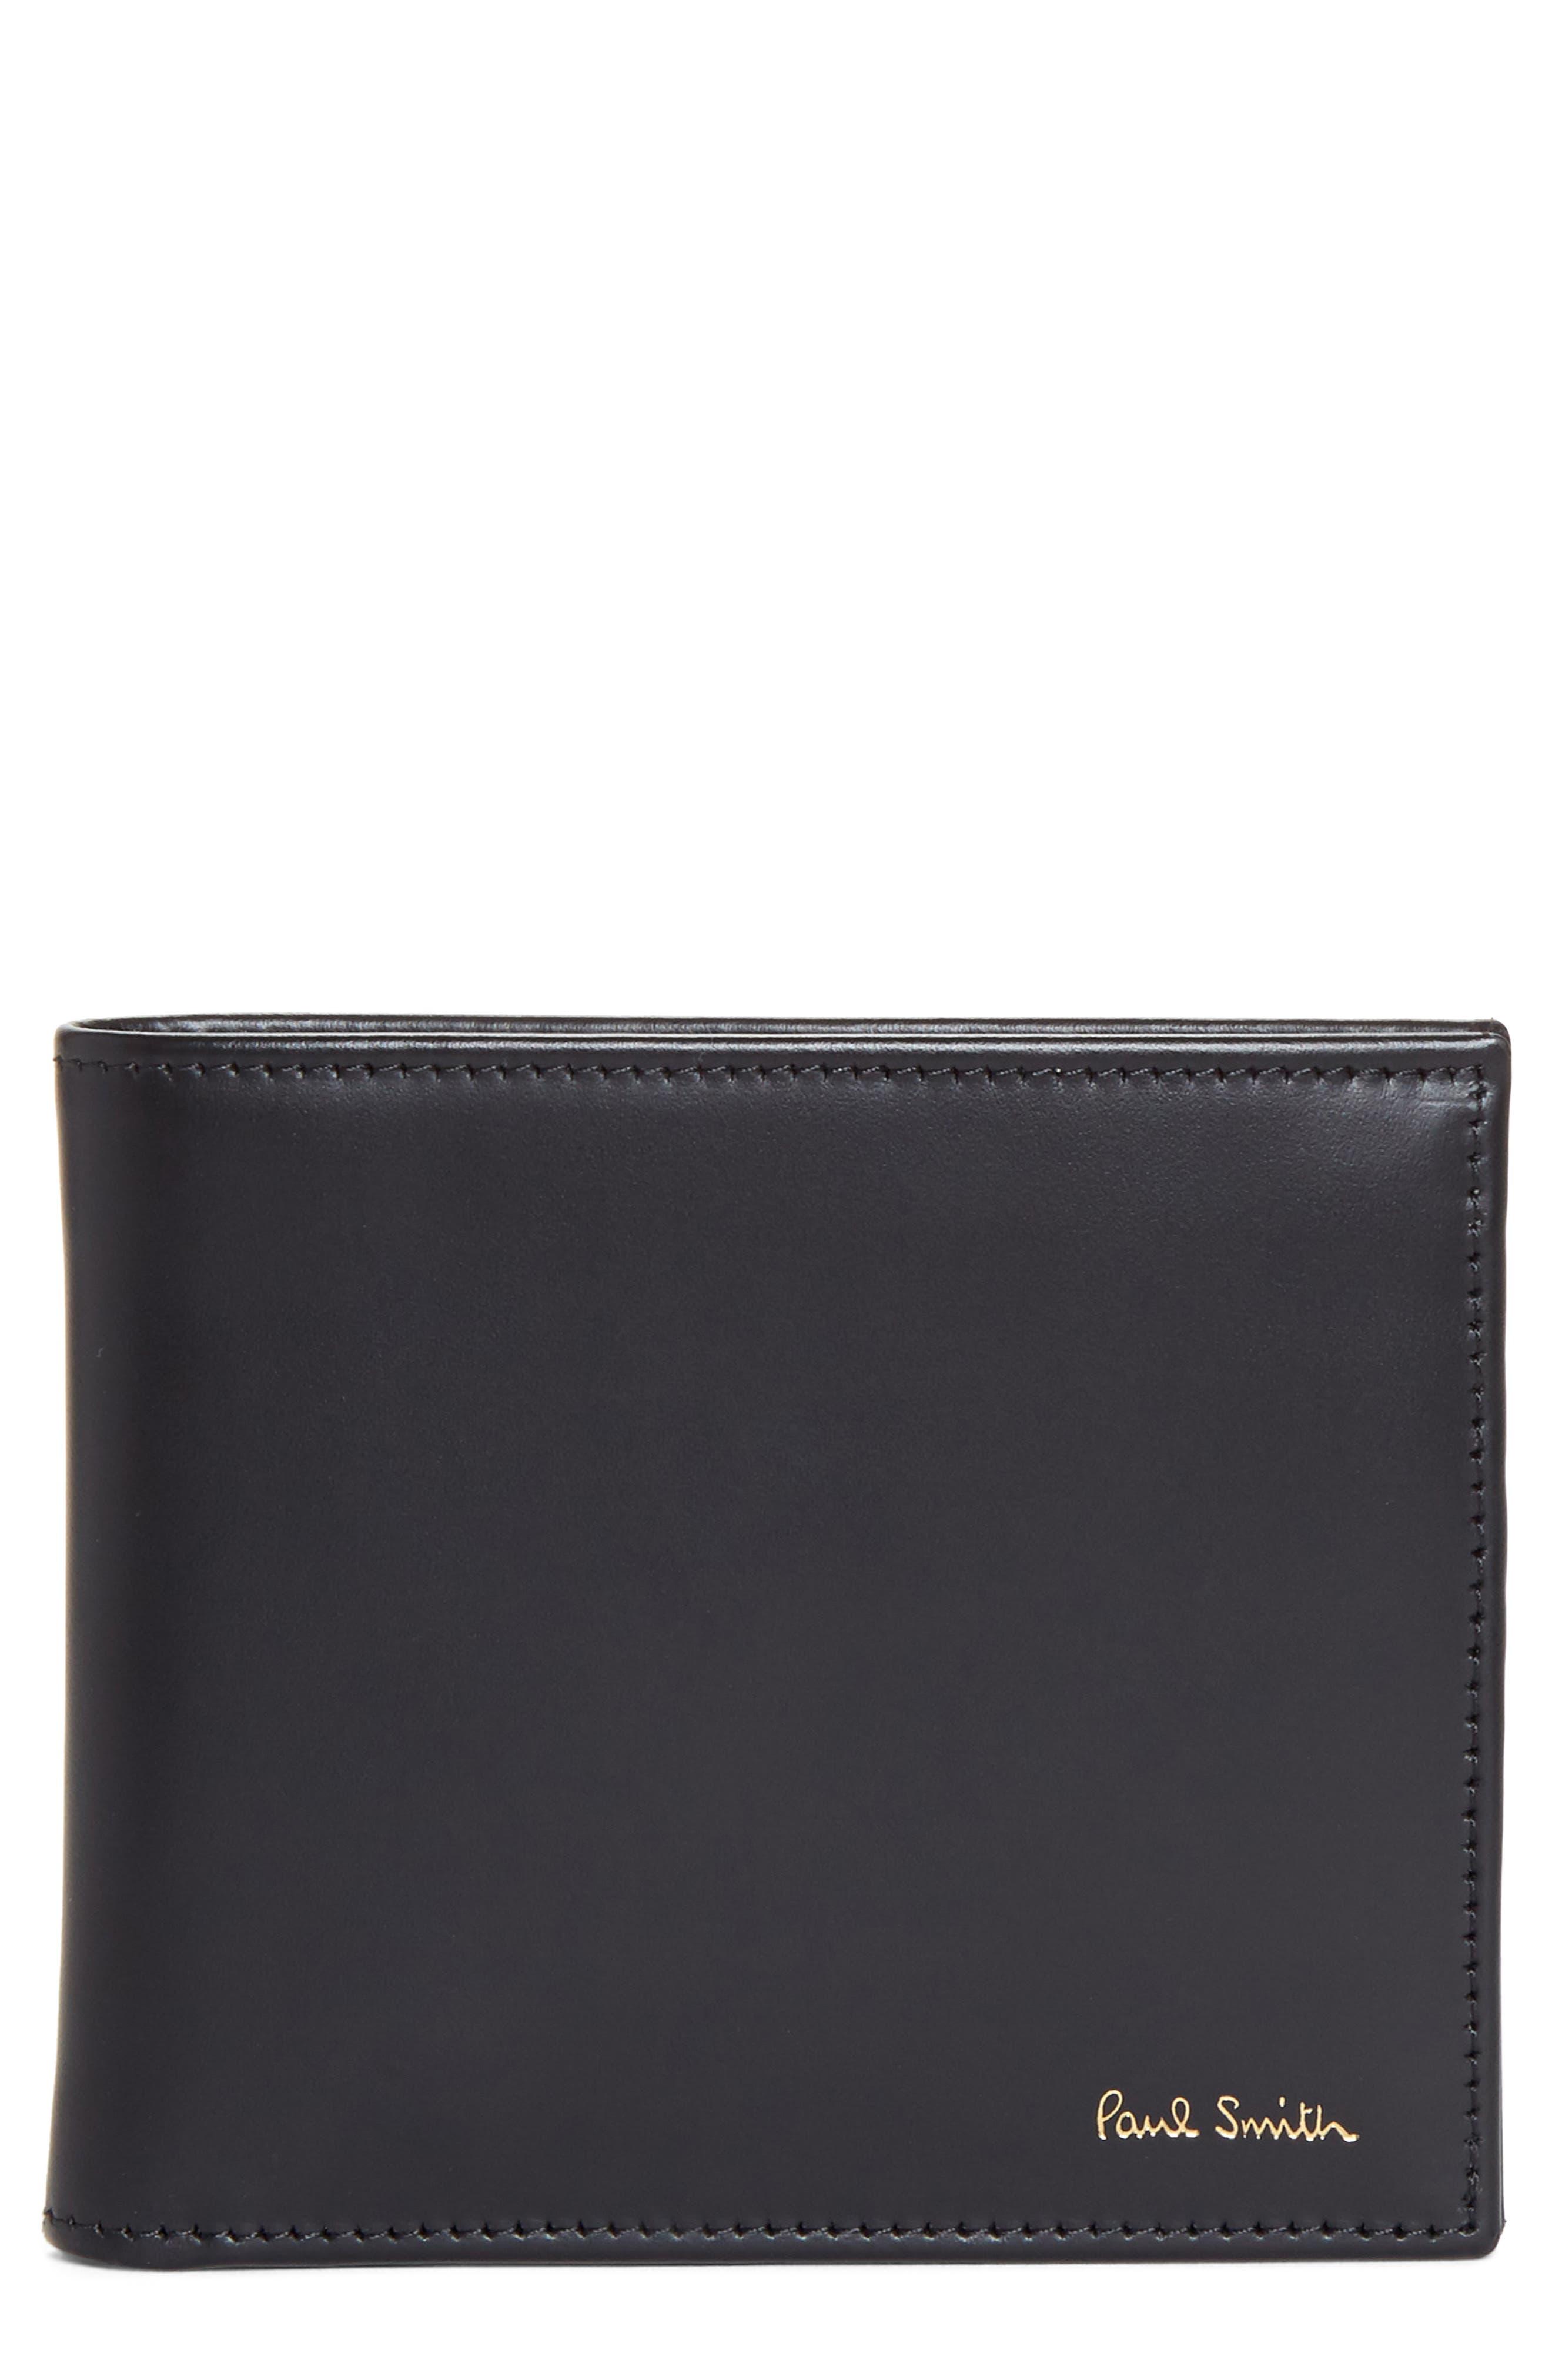 Multistripe Leather Wallet,                             Main thumbnail 1, color,                             Black